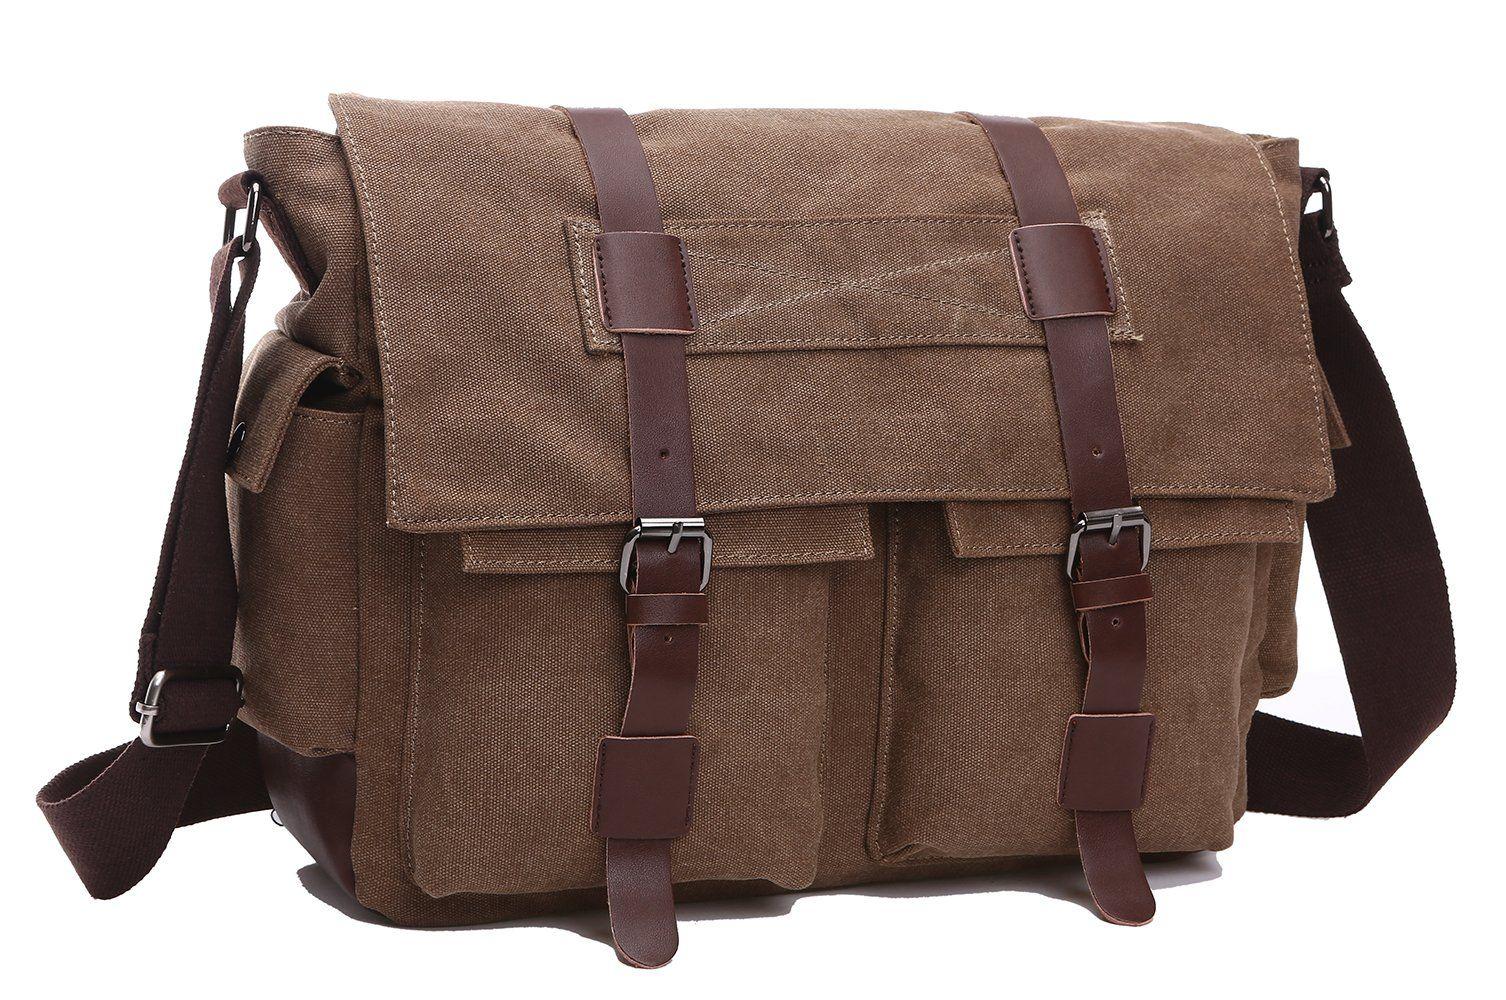 e4ea0b16dc ZUOLUNDUO Vintage Canvas Laptop Messenger Bag School Bag Business Briefcase  8168DJ1